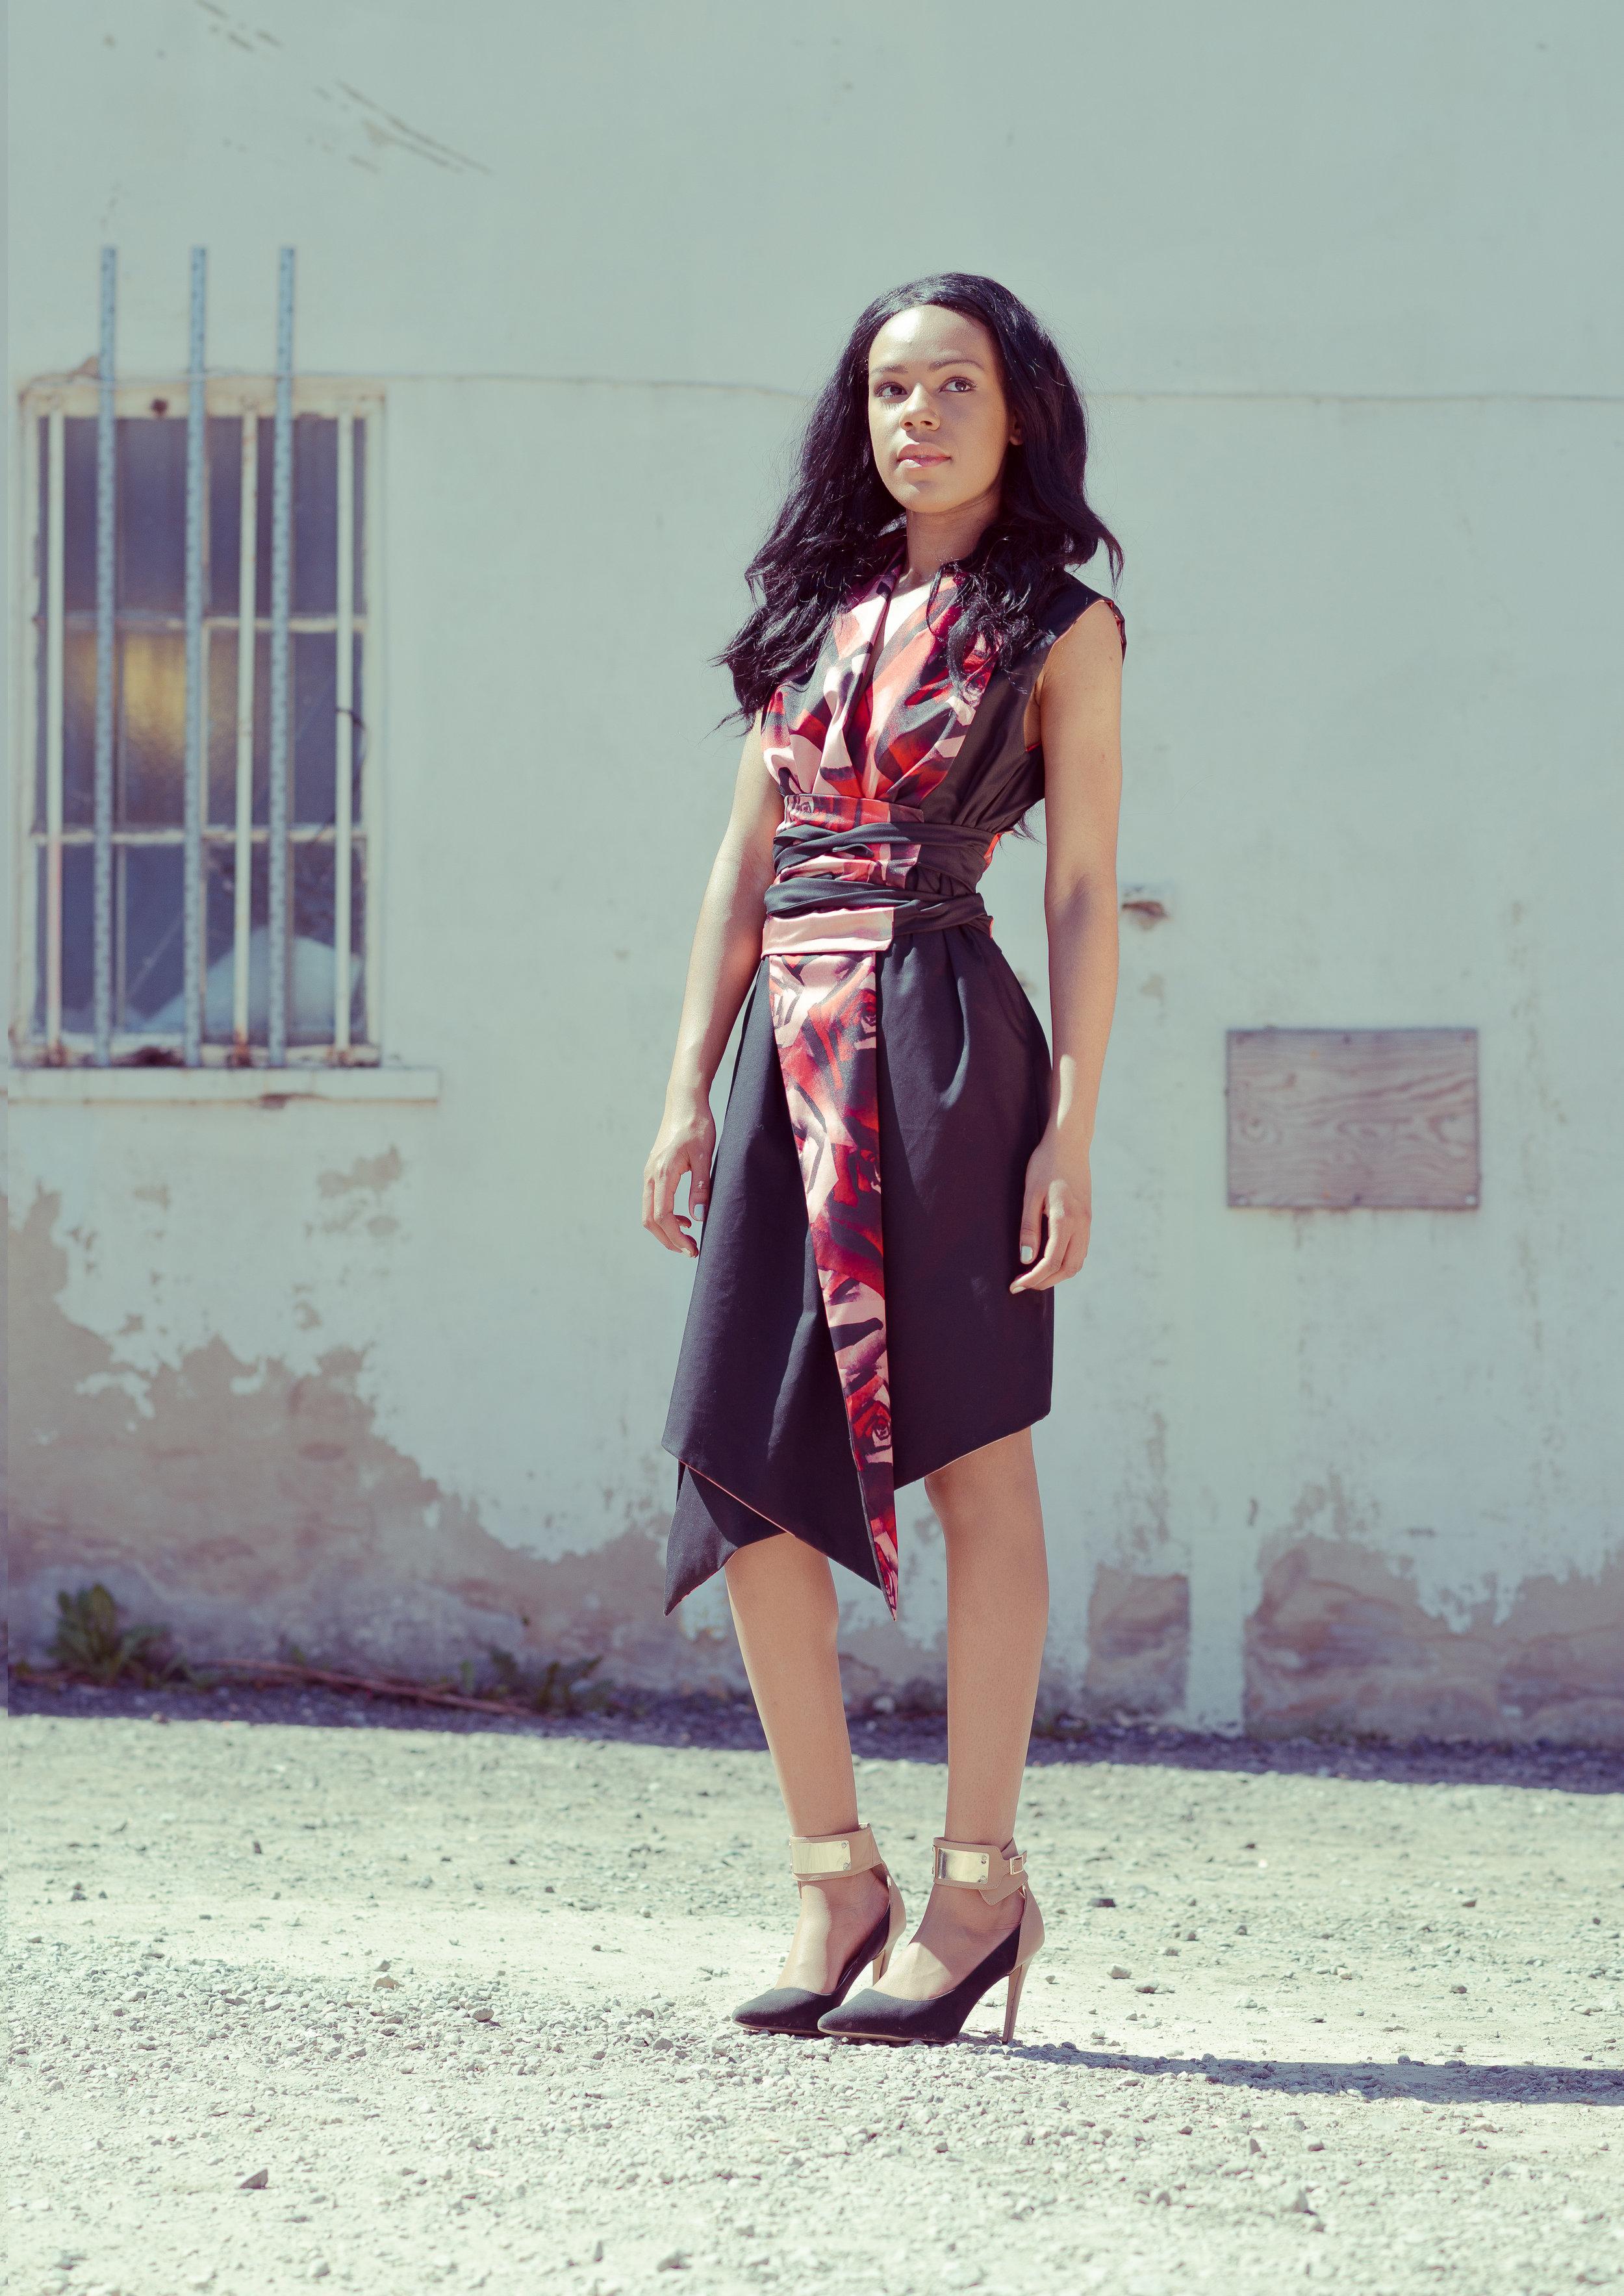 zaramia-ava-zaramiaava-leeds-fashion-designer-ethical-sustainable-tailored-minimalist-emi-red-print-black-jacket-belt-point-skirt-versatile-drape-cowl-styling-womenswear-models--2